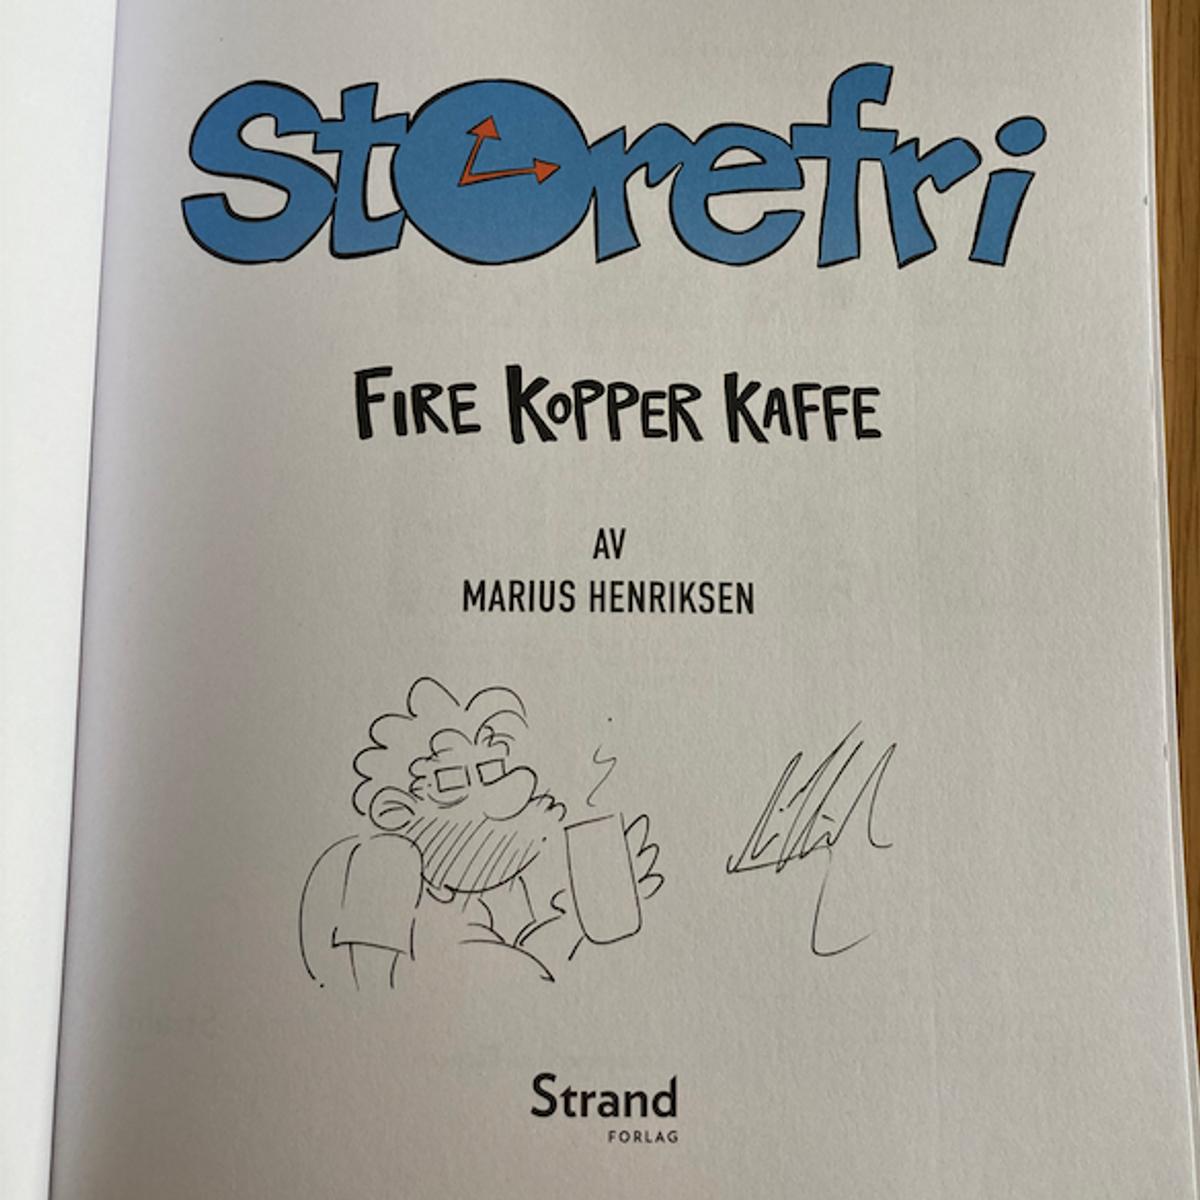 Storefri - Fire kopper kaffe SIGNERT